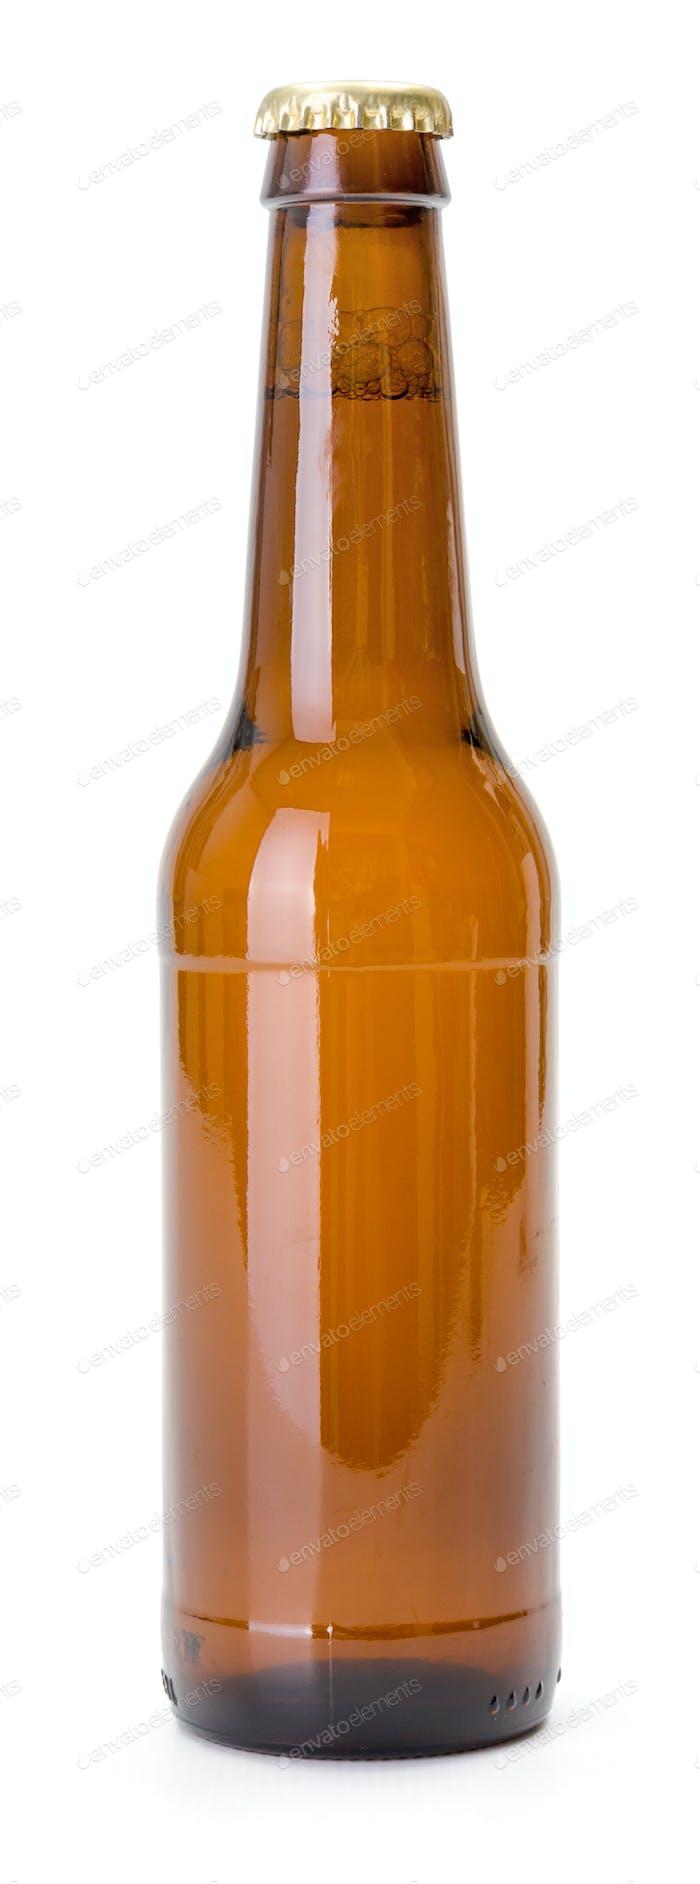 Brown beer bottle